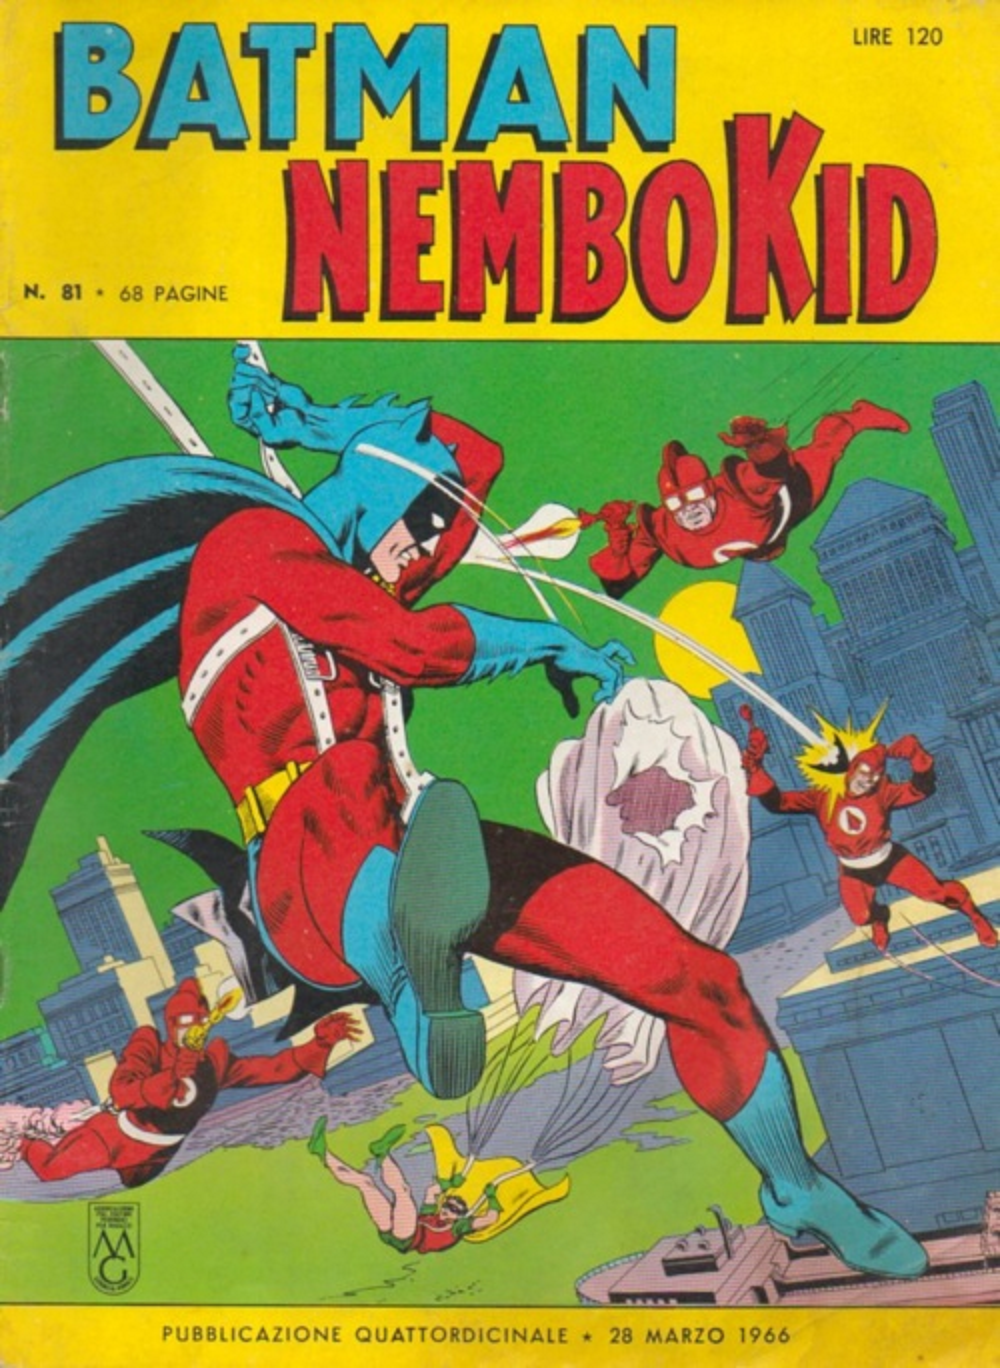 Batman Nembo Kid N81